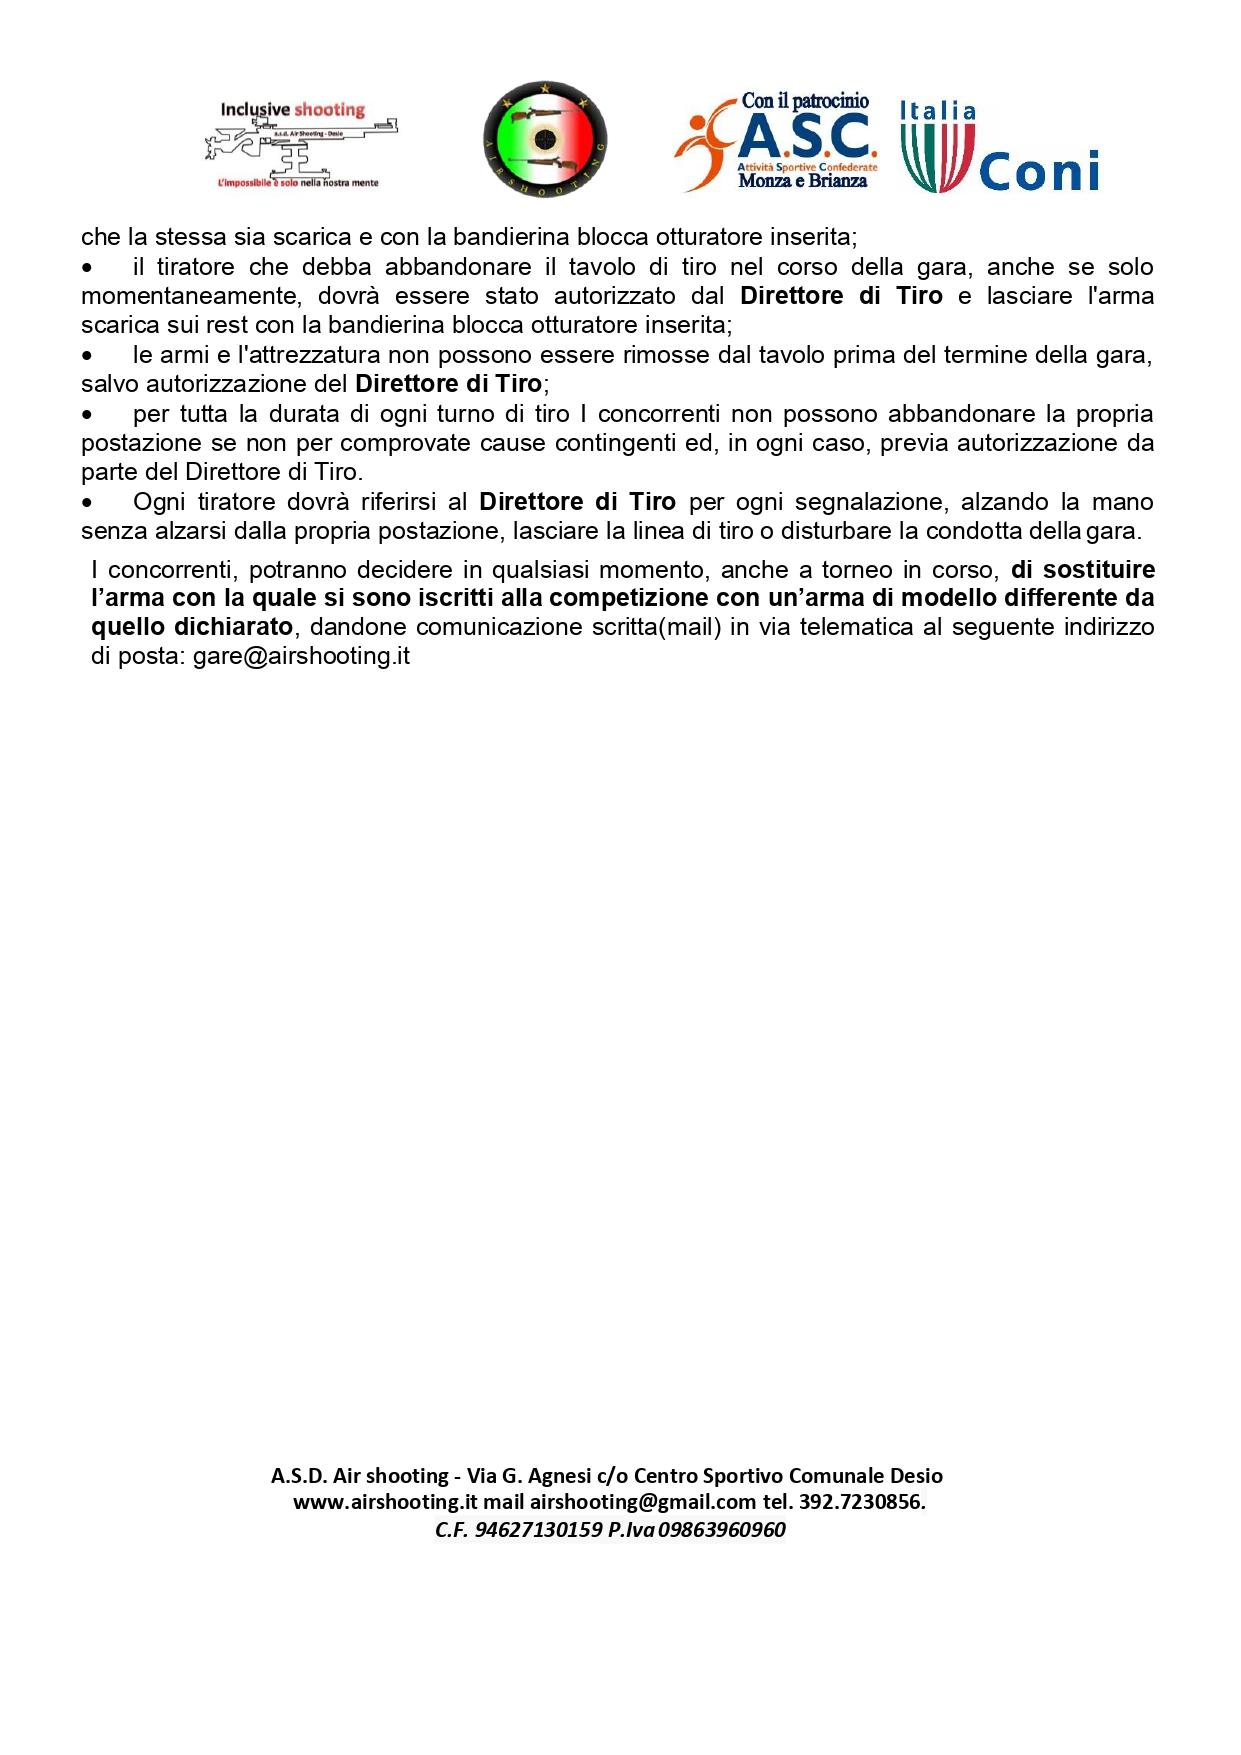 reg campionato 2021 1_page-0010